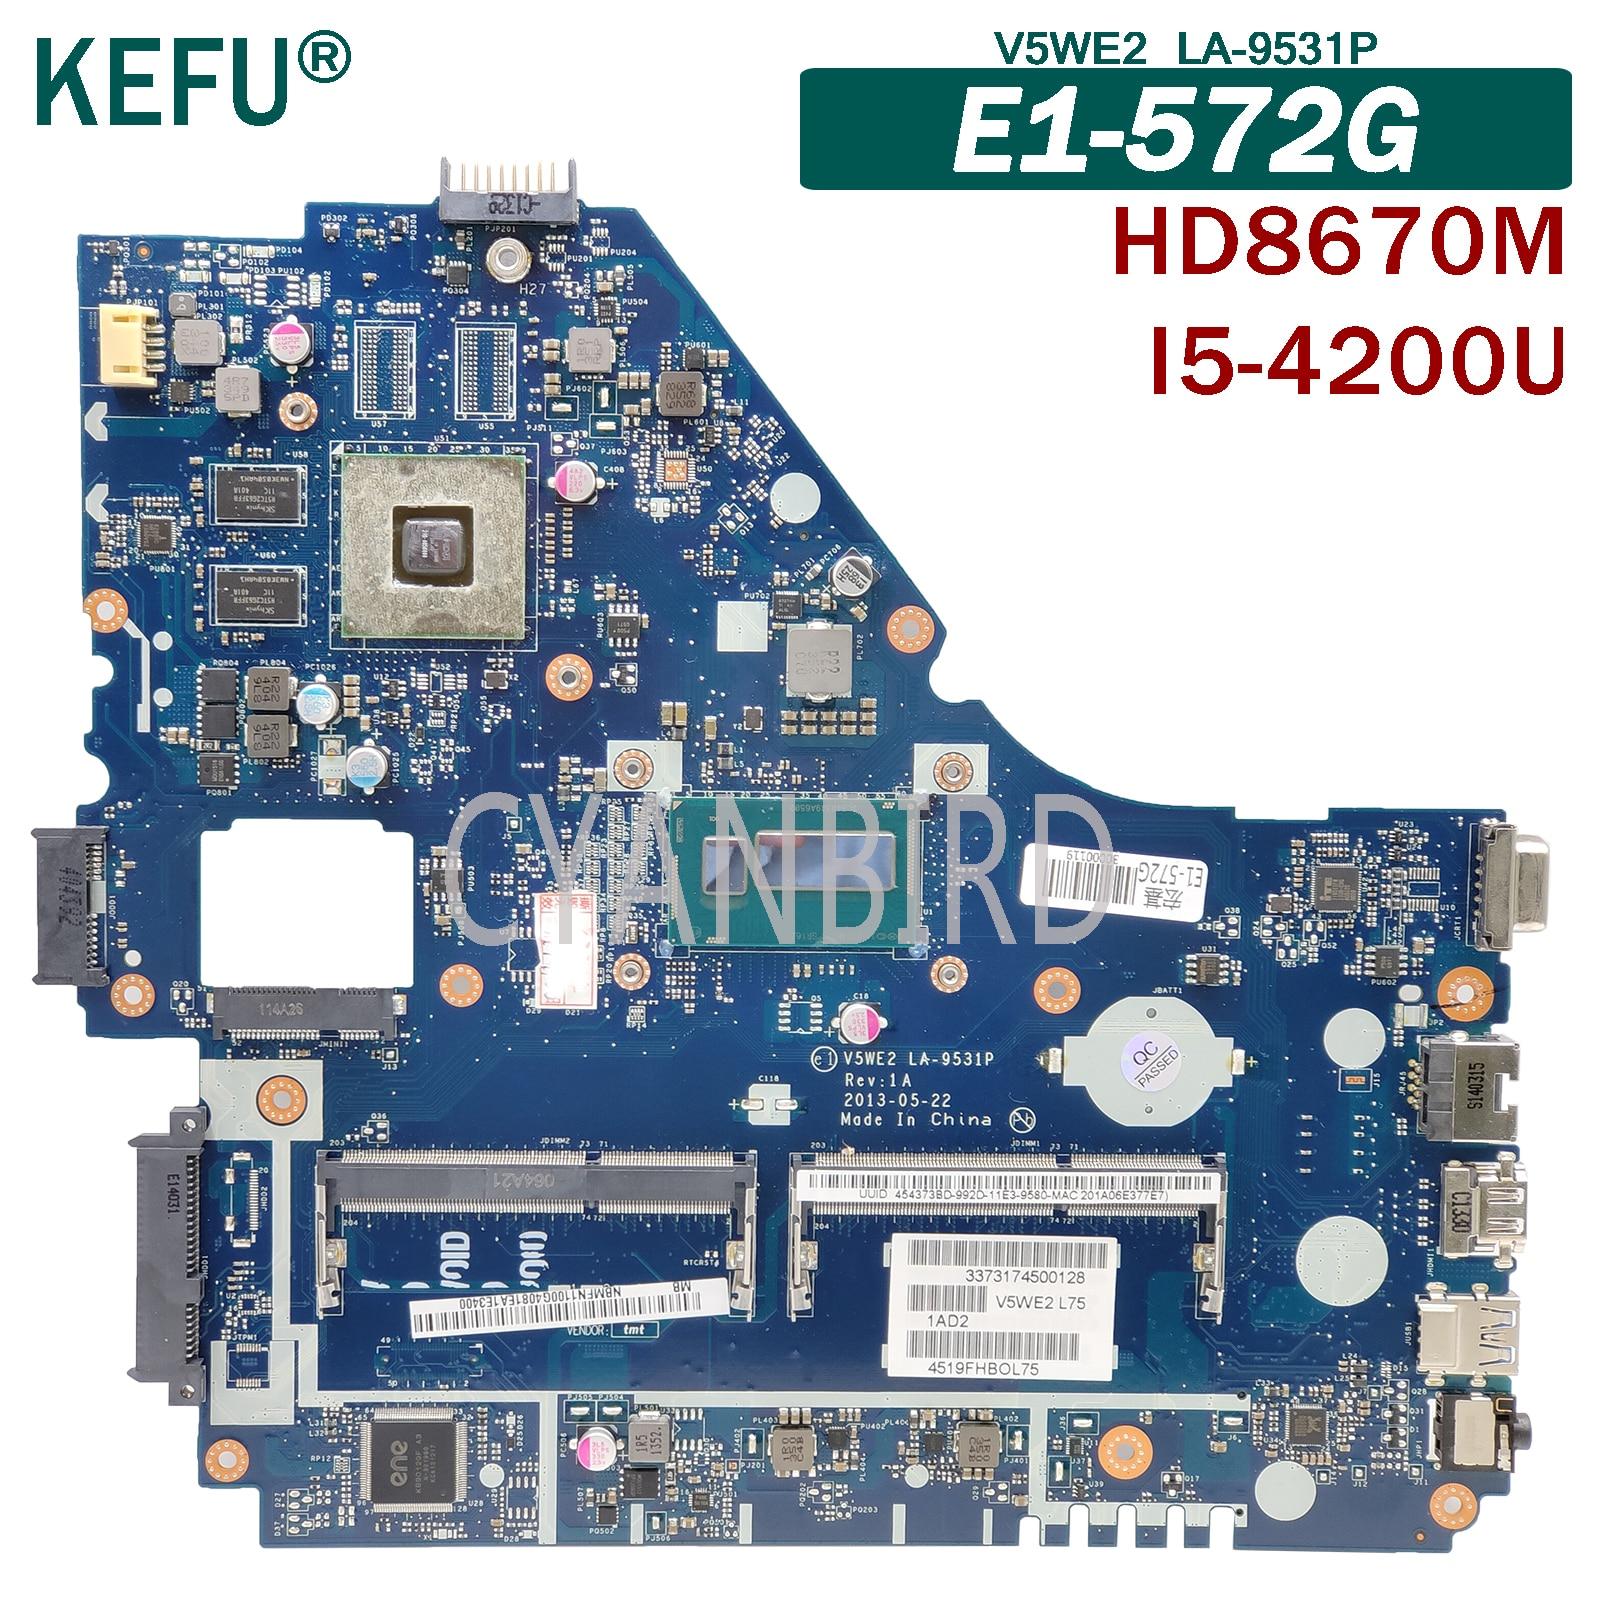 KEFU V5WE2 LA-9531P اللوحة الرئيسية الأصلية لشركة أيسر E1-572G مع I5-4200U HD8670M/R5 اللوحة الأم للكمبيوتر المحمول